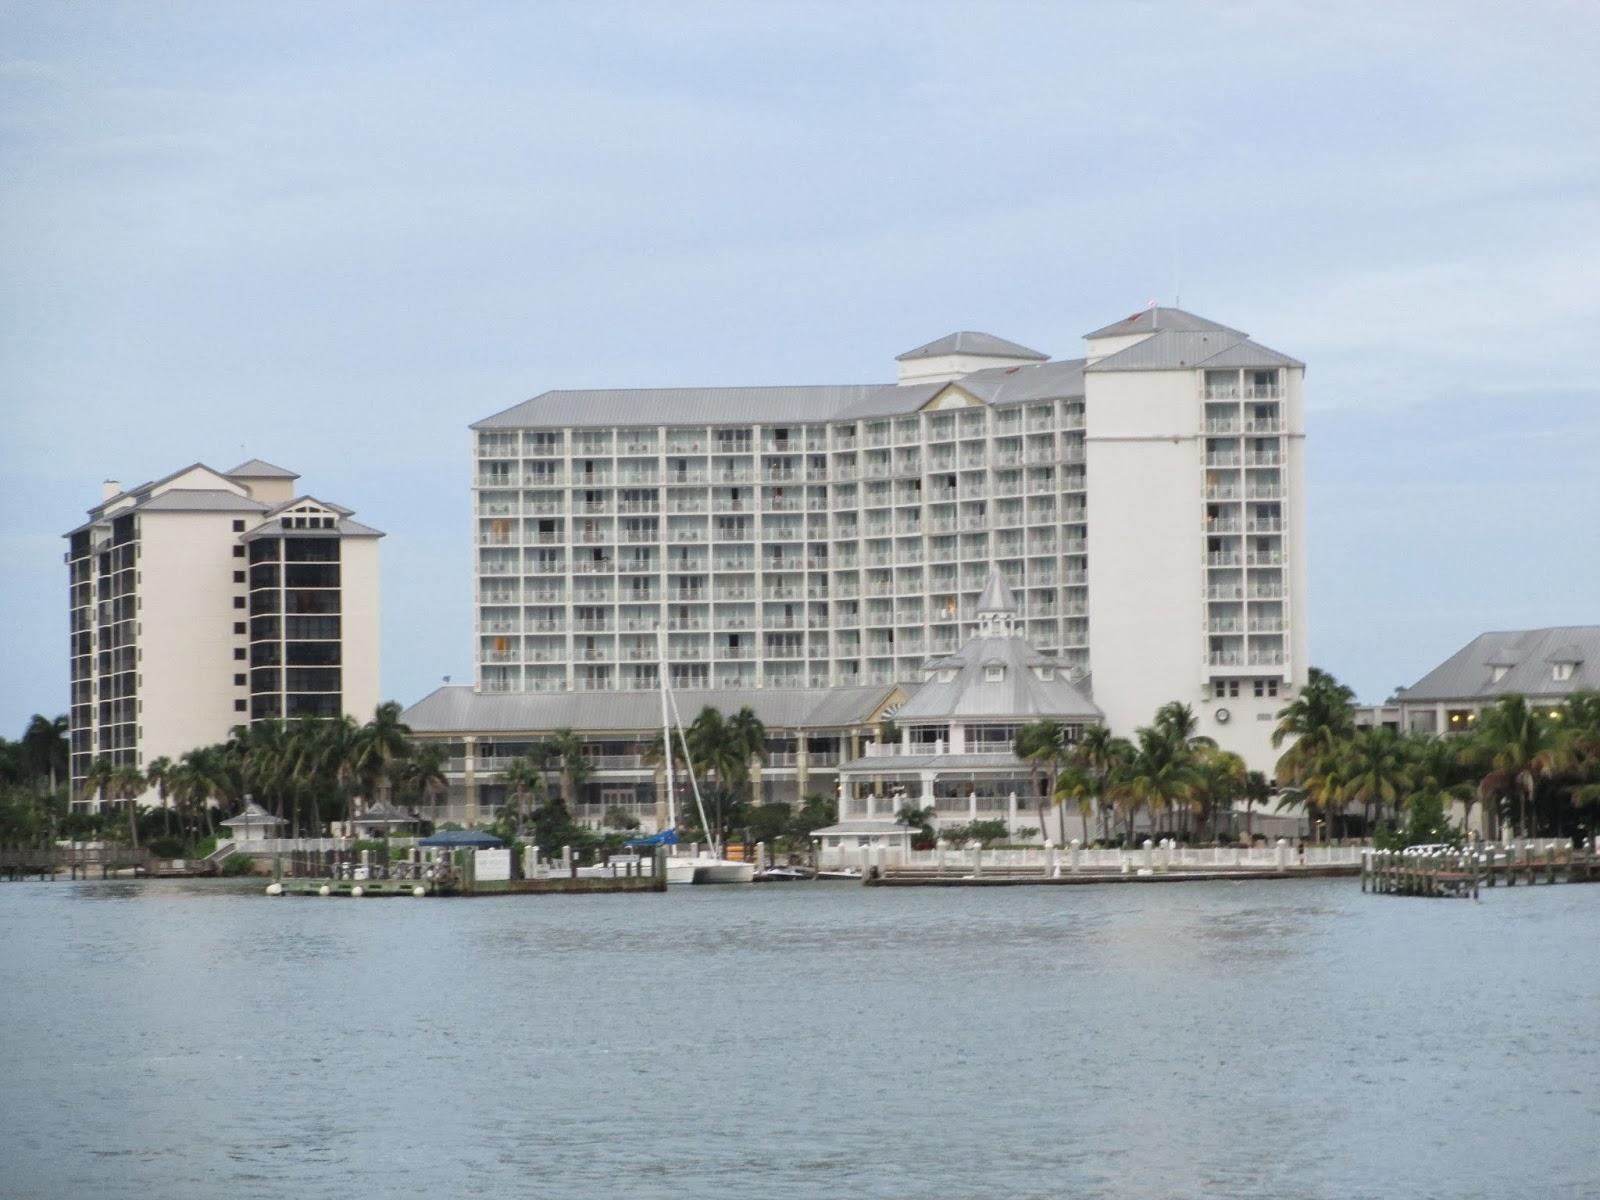 Sanibel Harbor Marriott Resort Spa